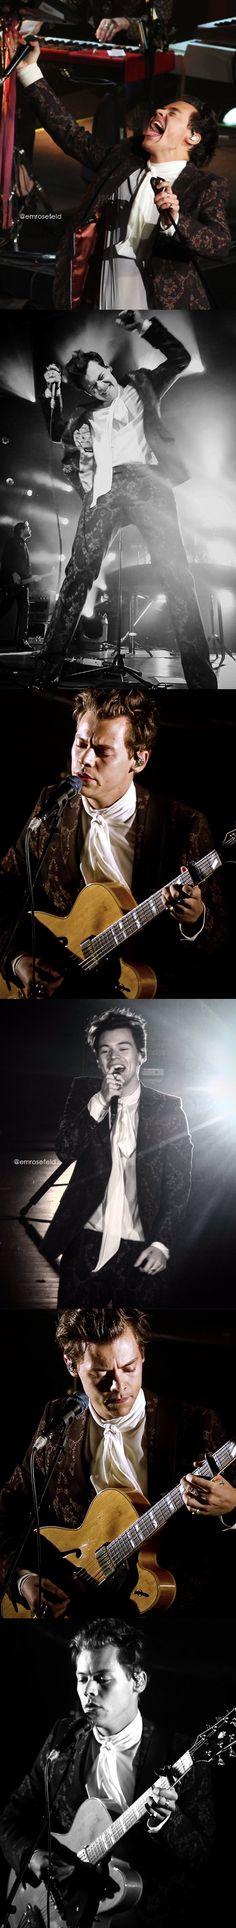 Harry Styles |  Ryman Auditorium Nashville, TN 9.25.17 | emrosefeld |